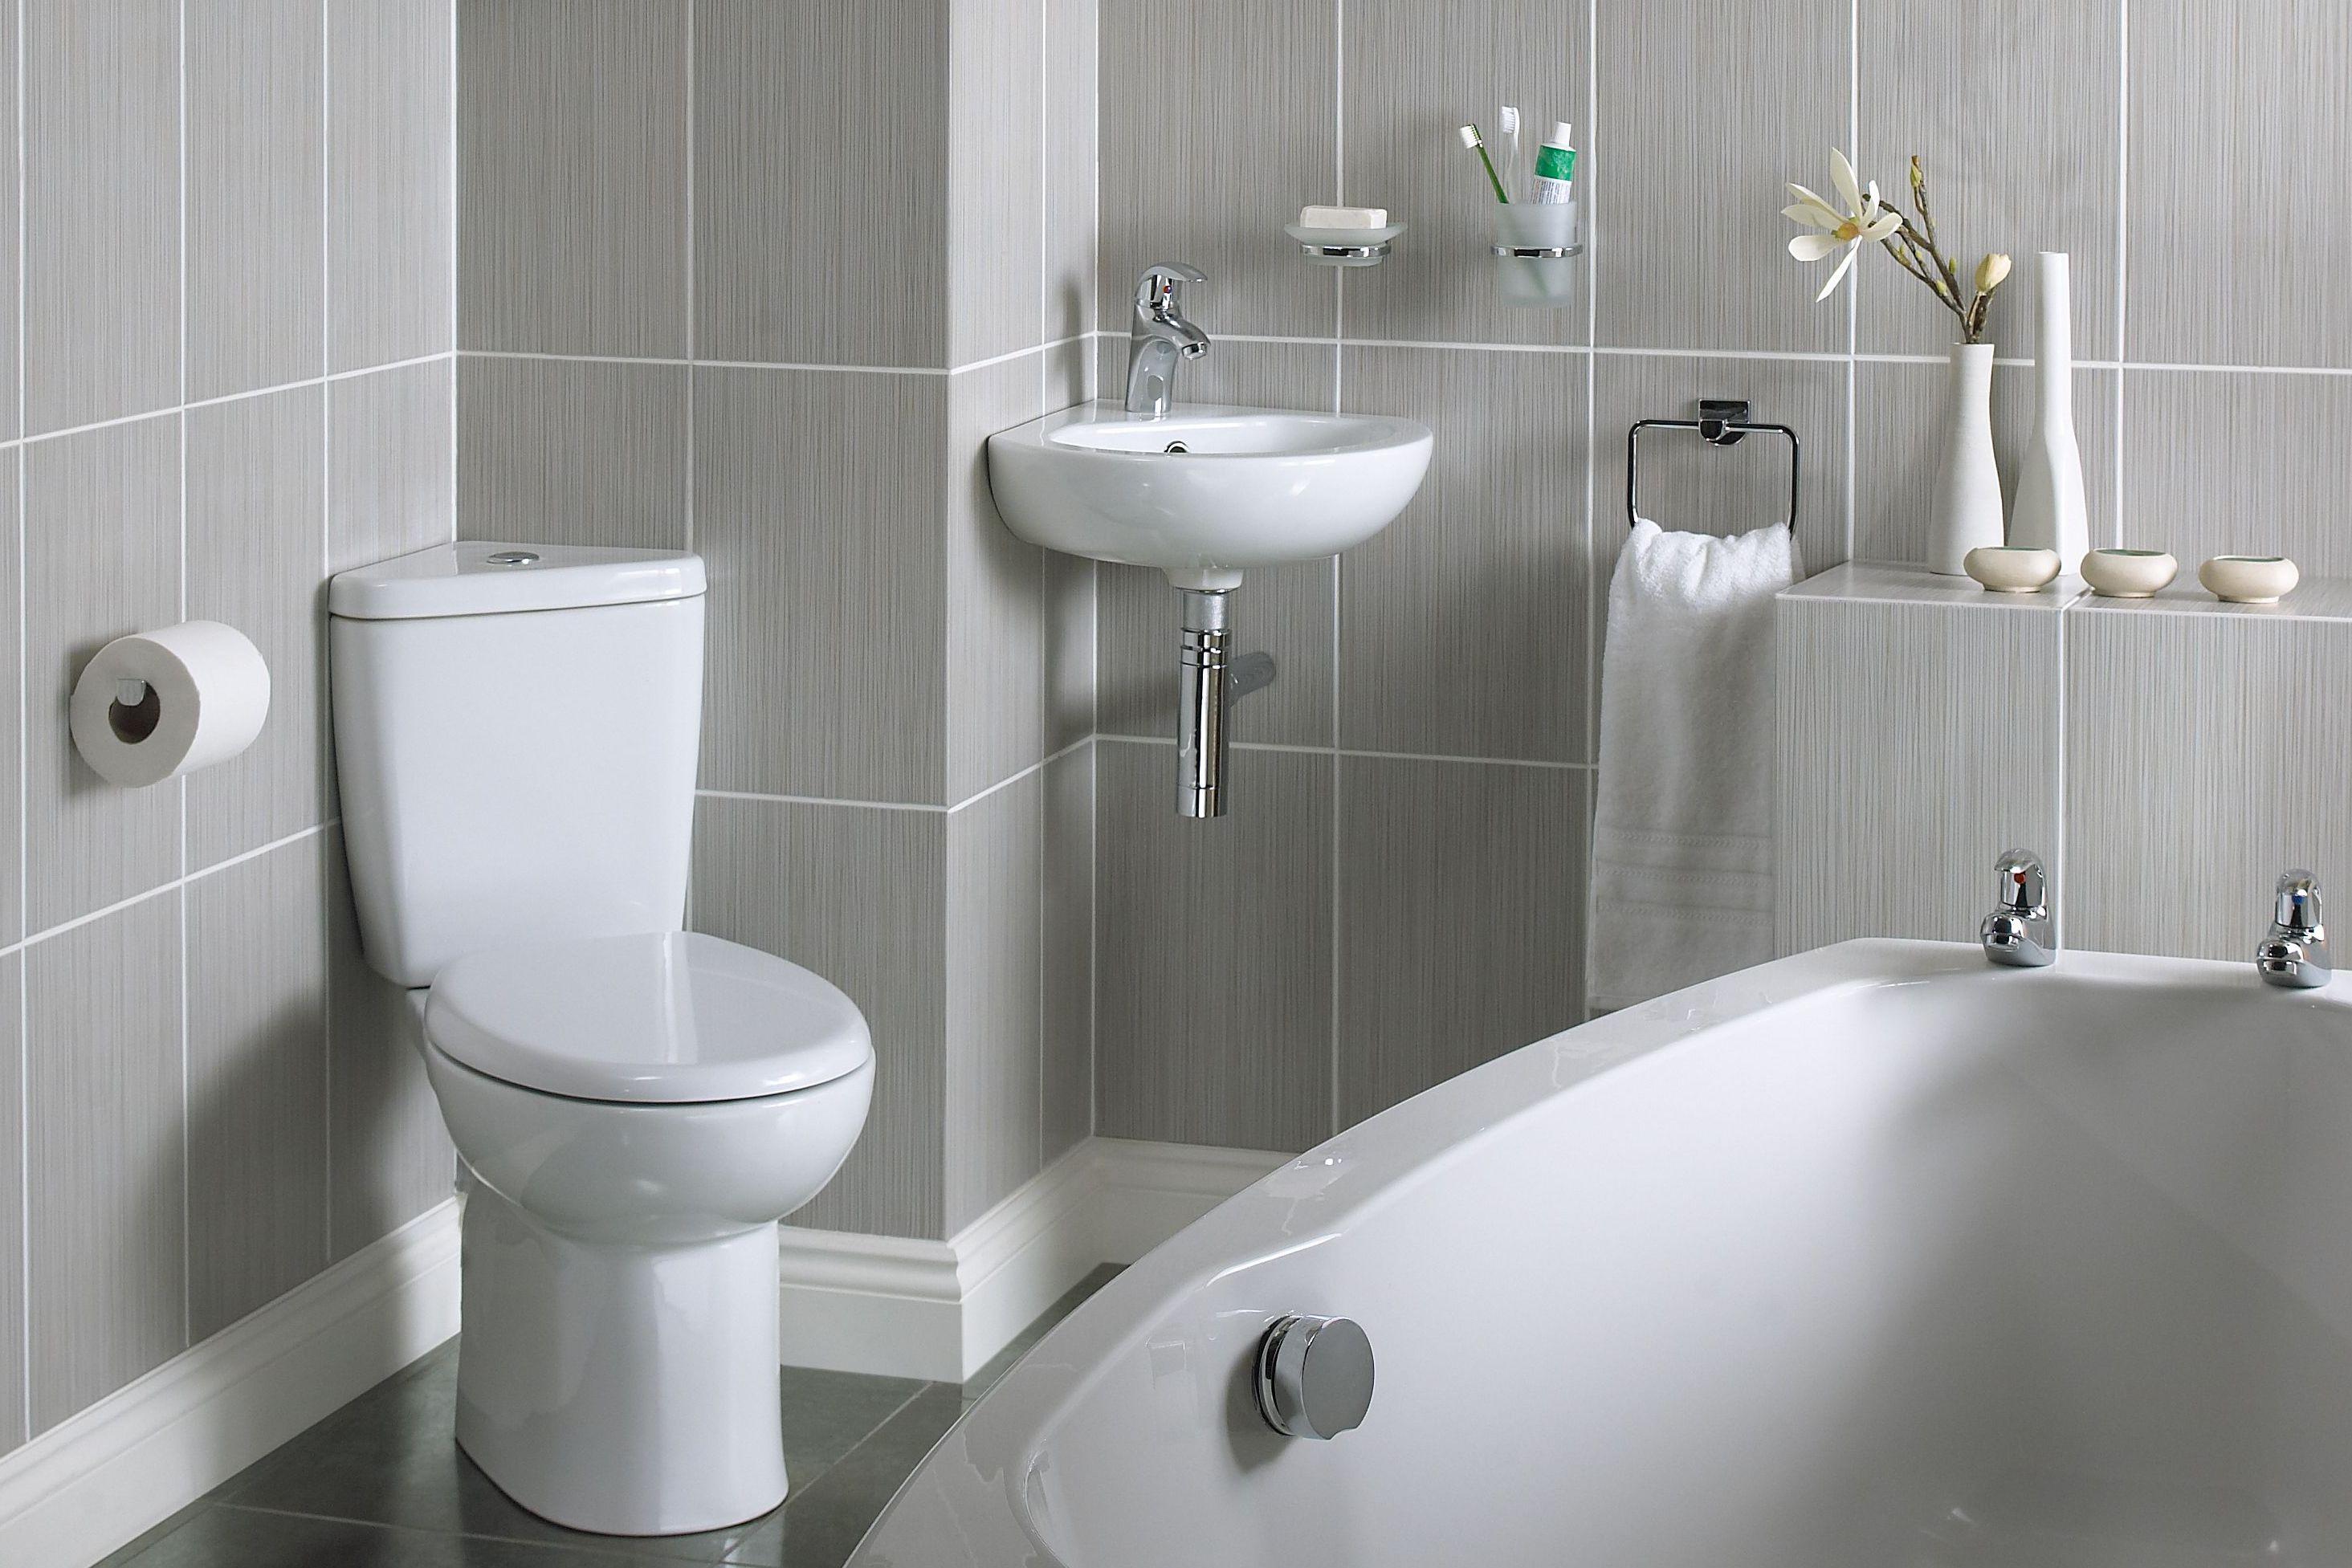 Bathrooms | Showering